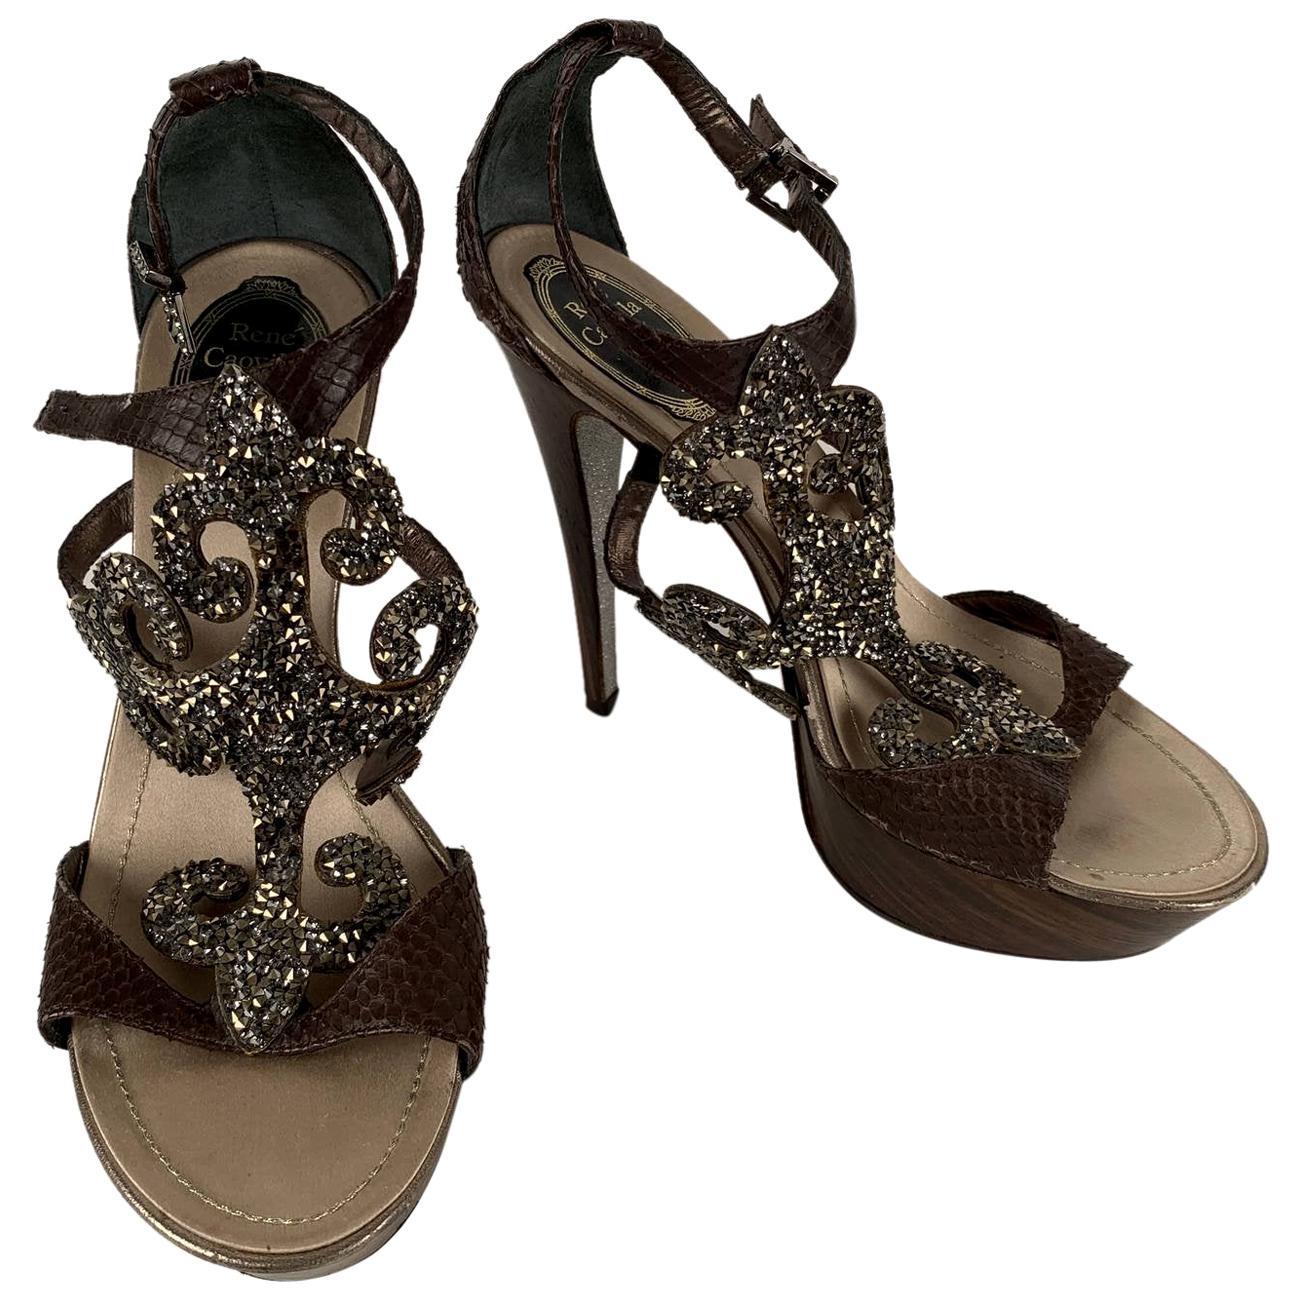 René Caovilla Rhinestones Sandals Heels Size 38